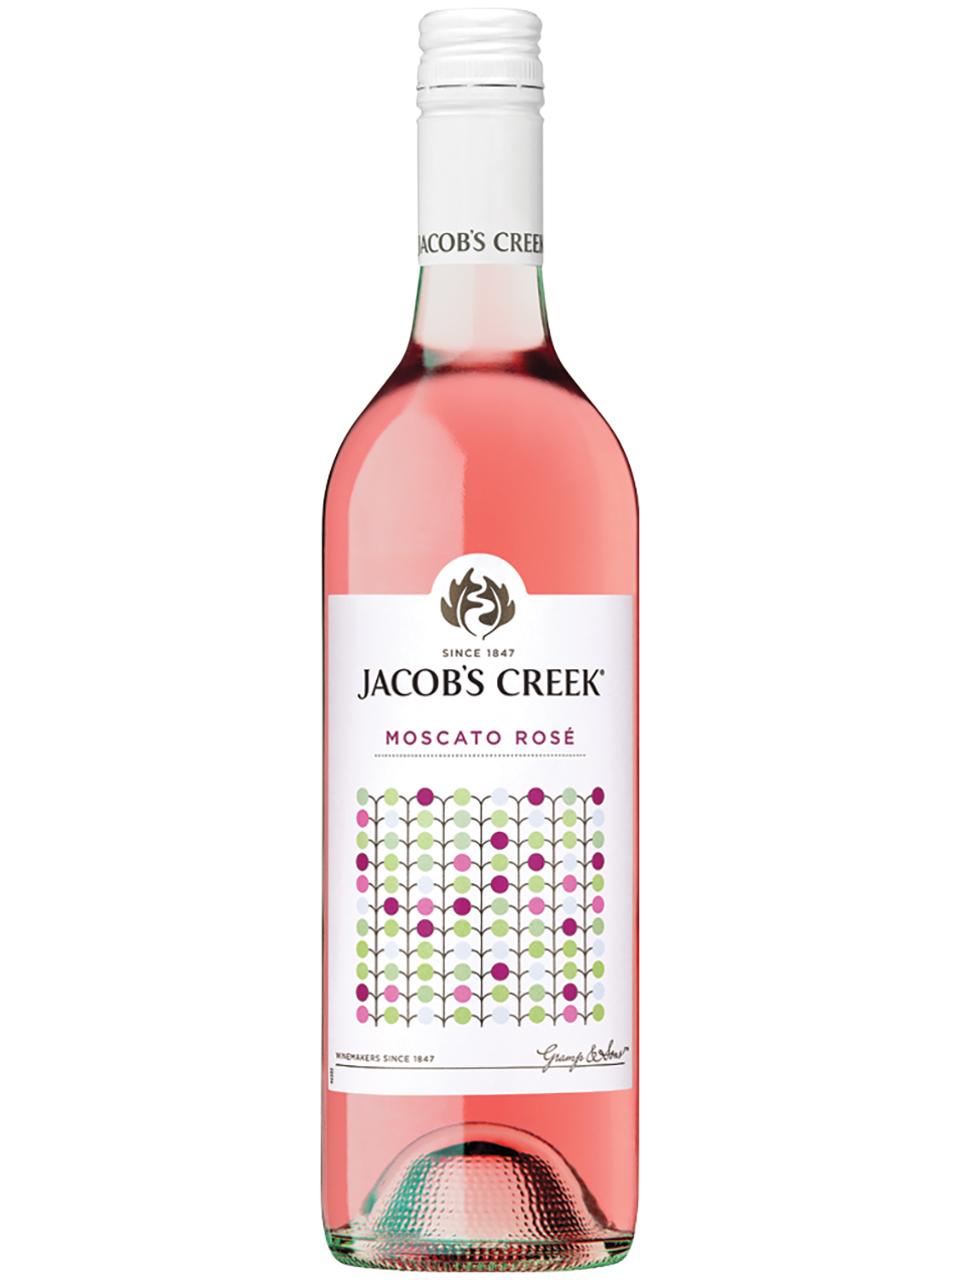 Jacob's Creek Moscato Rose